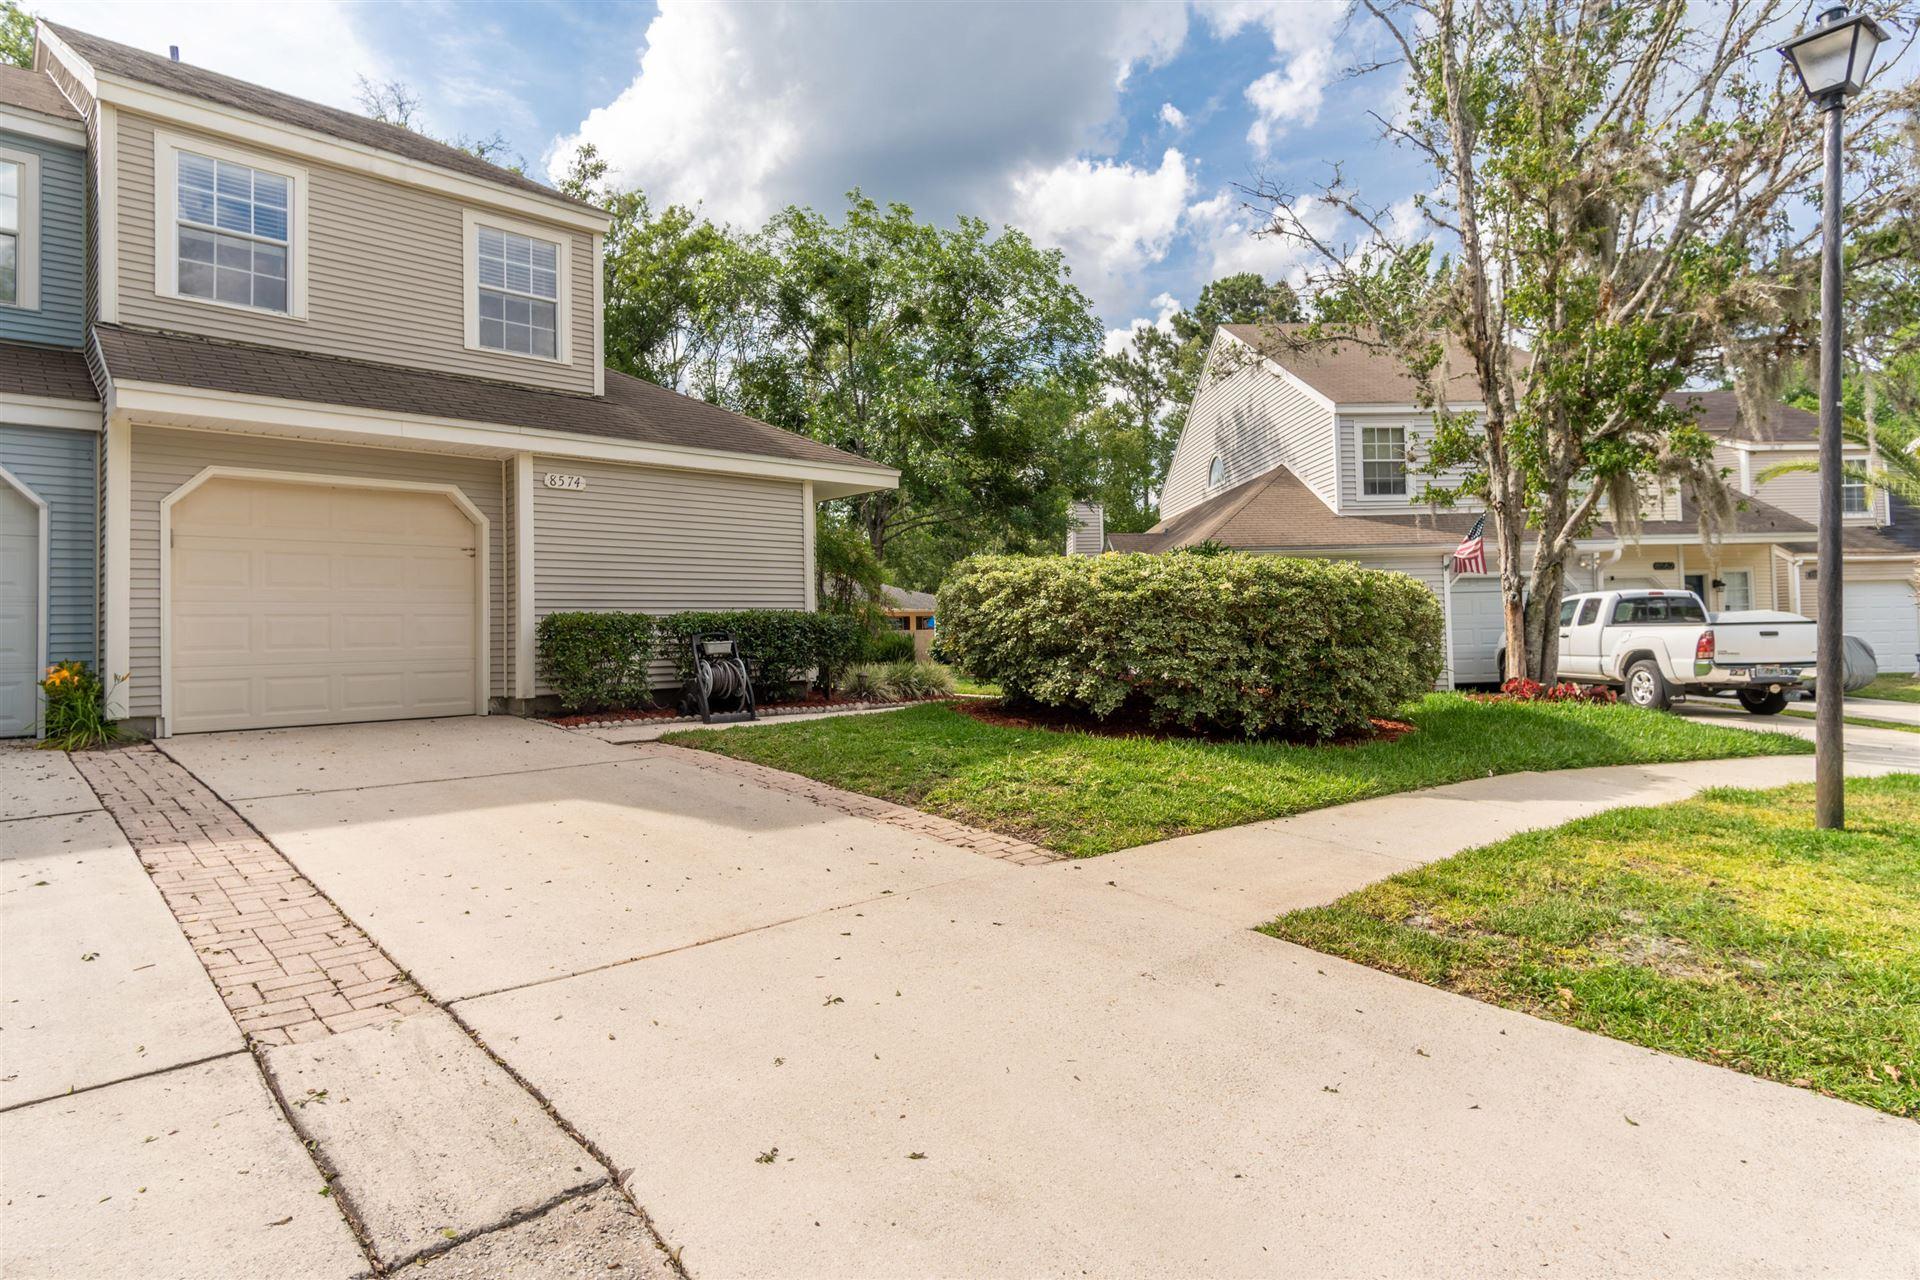 Photo of 8574 STURBRIDGE CIR W #Lot No: 11, JACKSONVILLE, FL 32244 (MLS # 1108603)